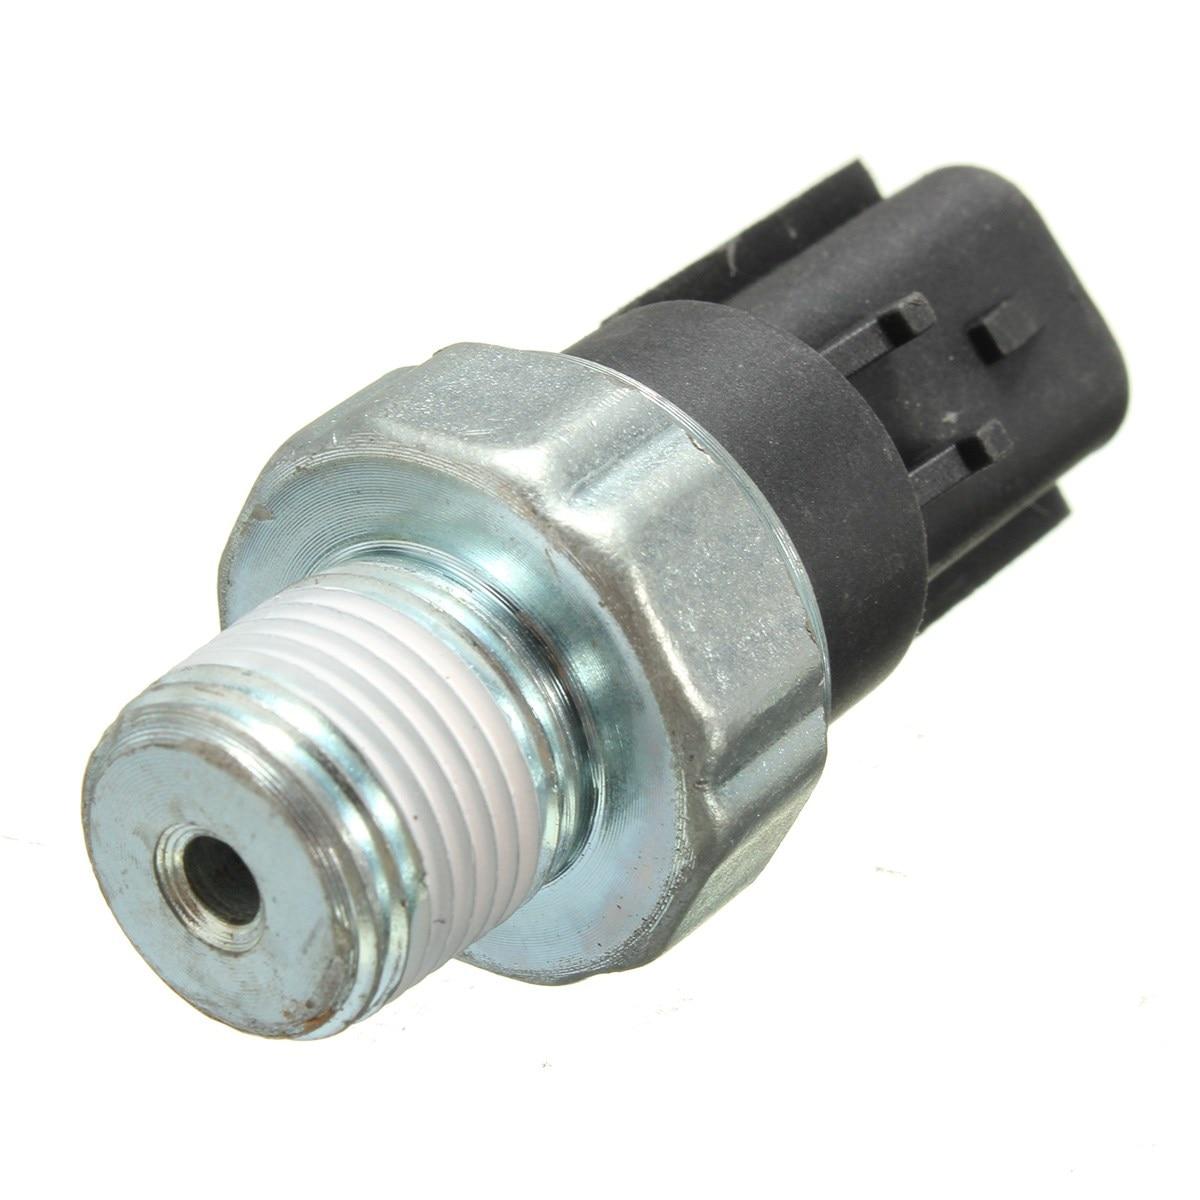 Car Auto Engine Oil Pressure Sensor Switch For Chrysler